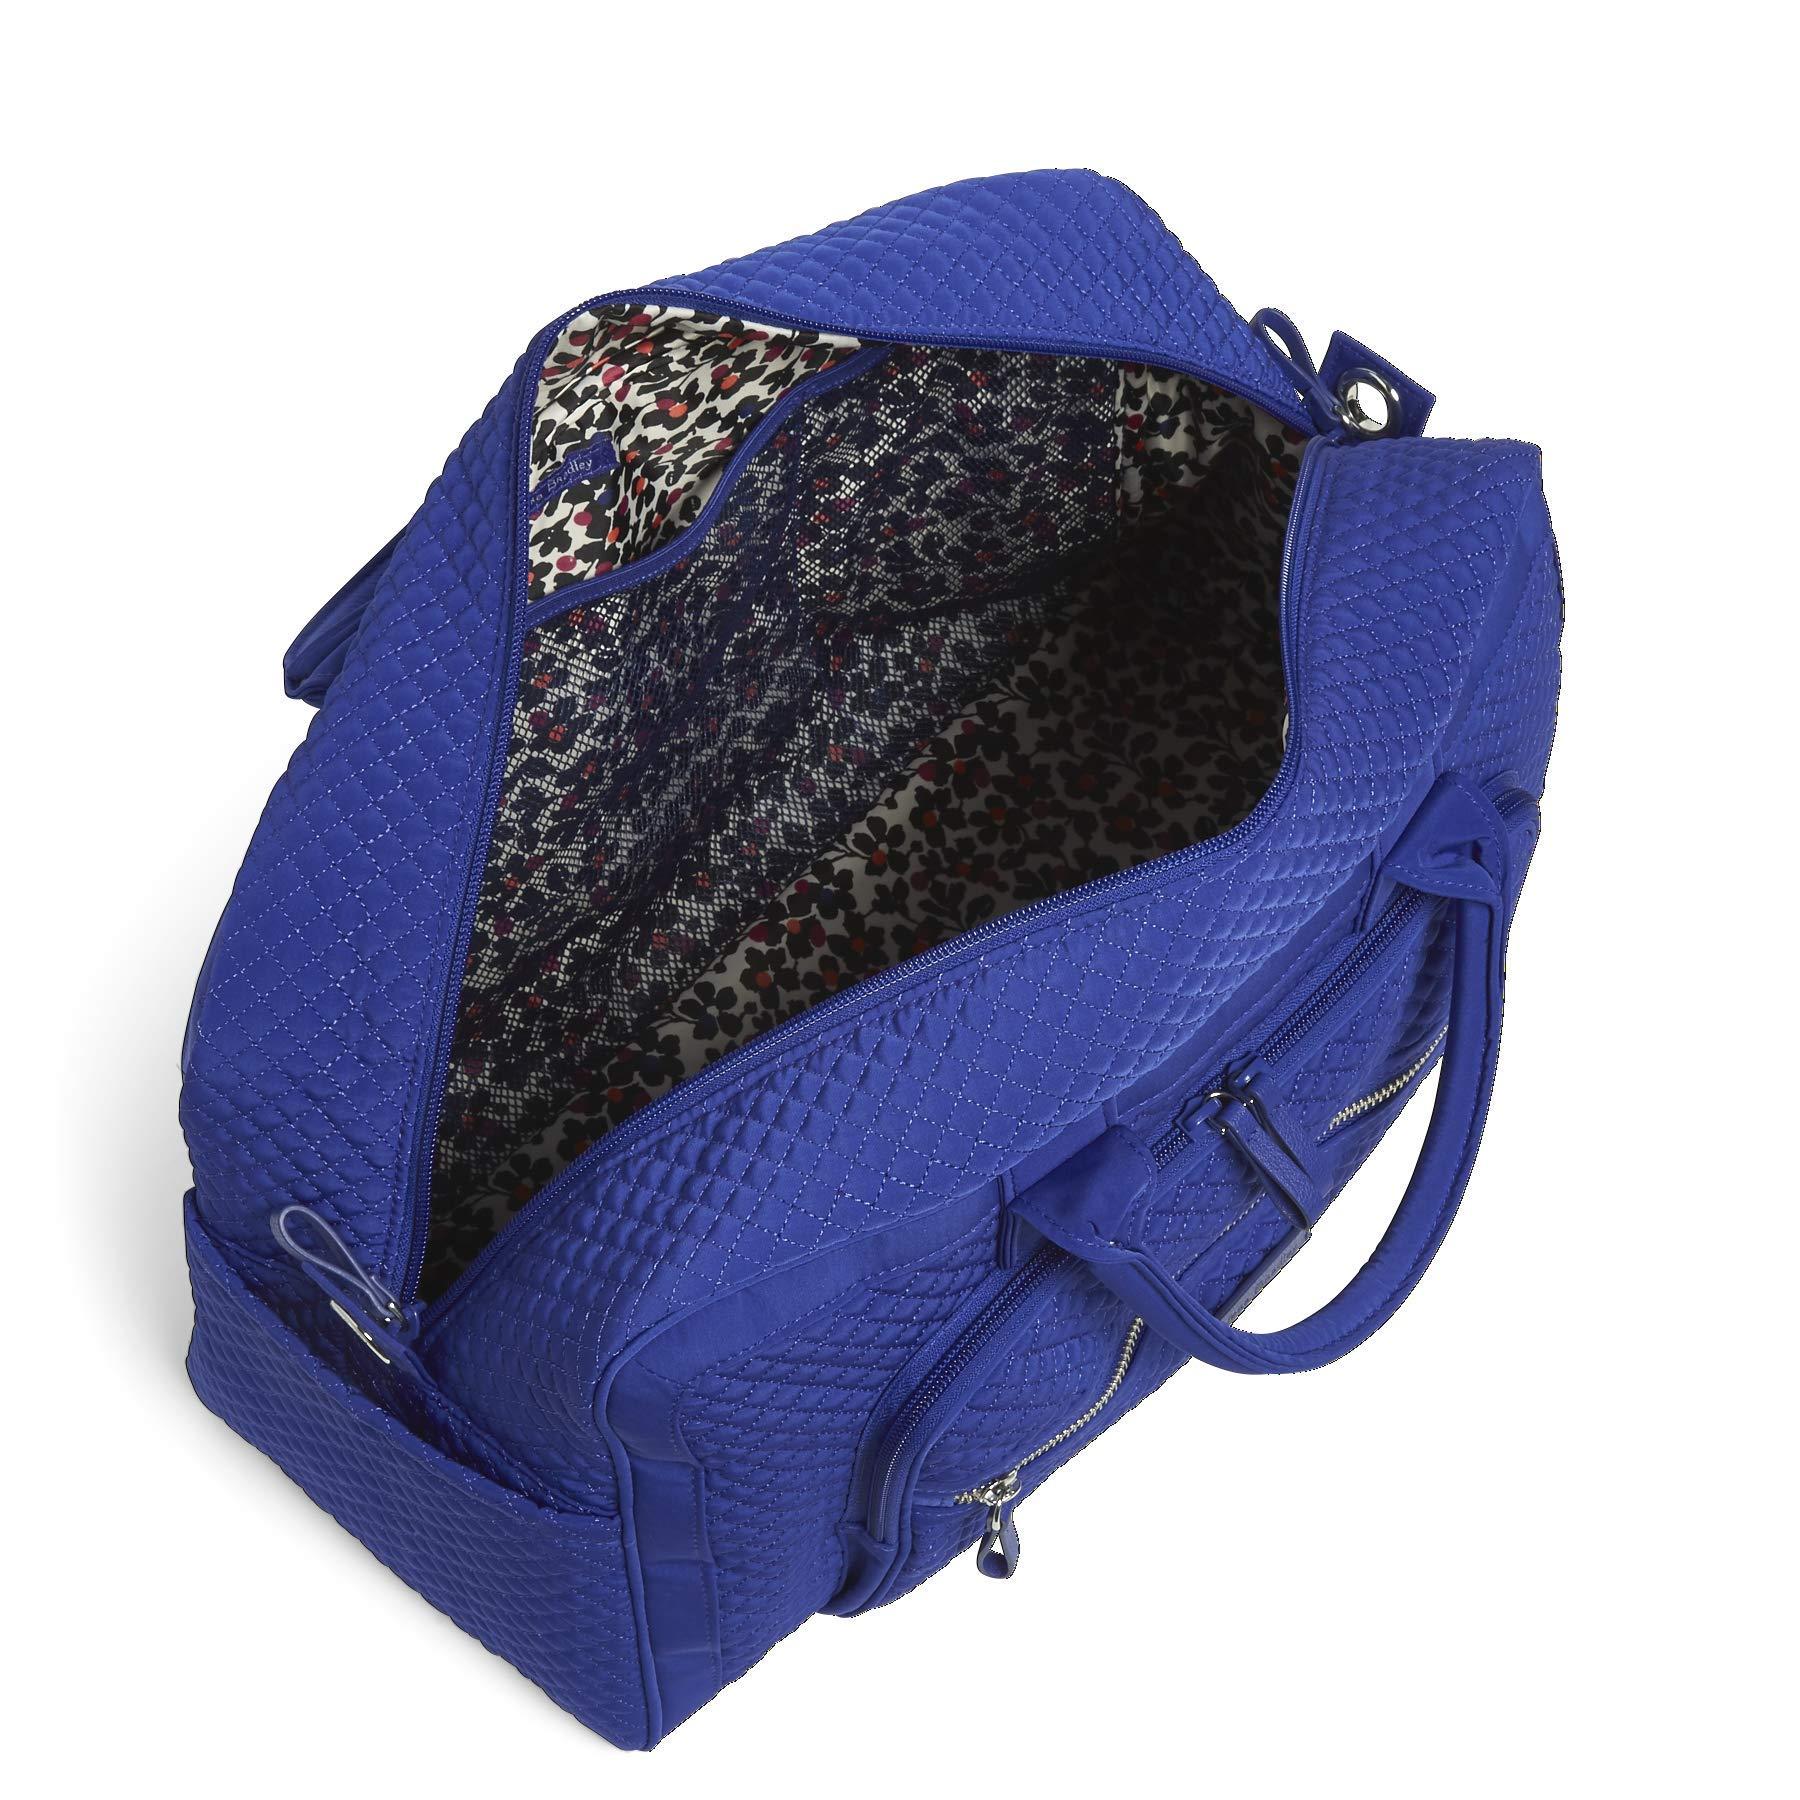 Vera Bradley Iconic Compact Weekender Travel Bag Vera,  gage Blue, One Size by Vera Bradley (Image #3)